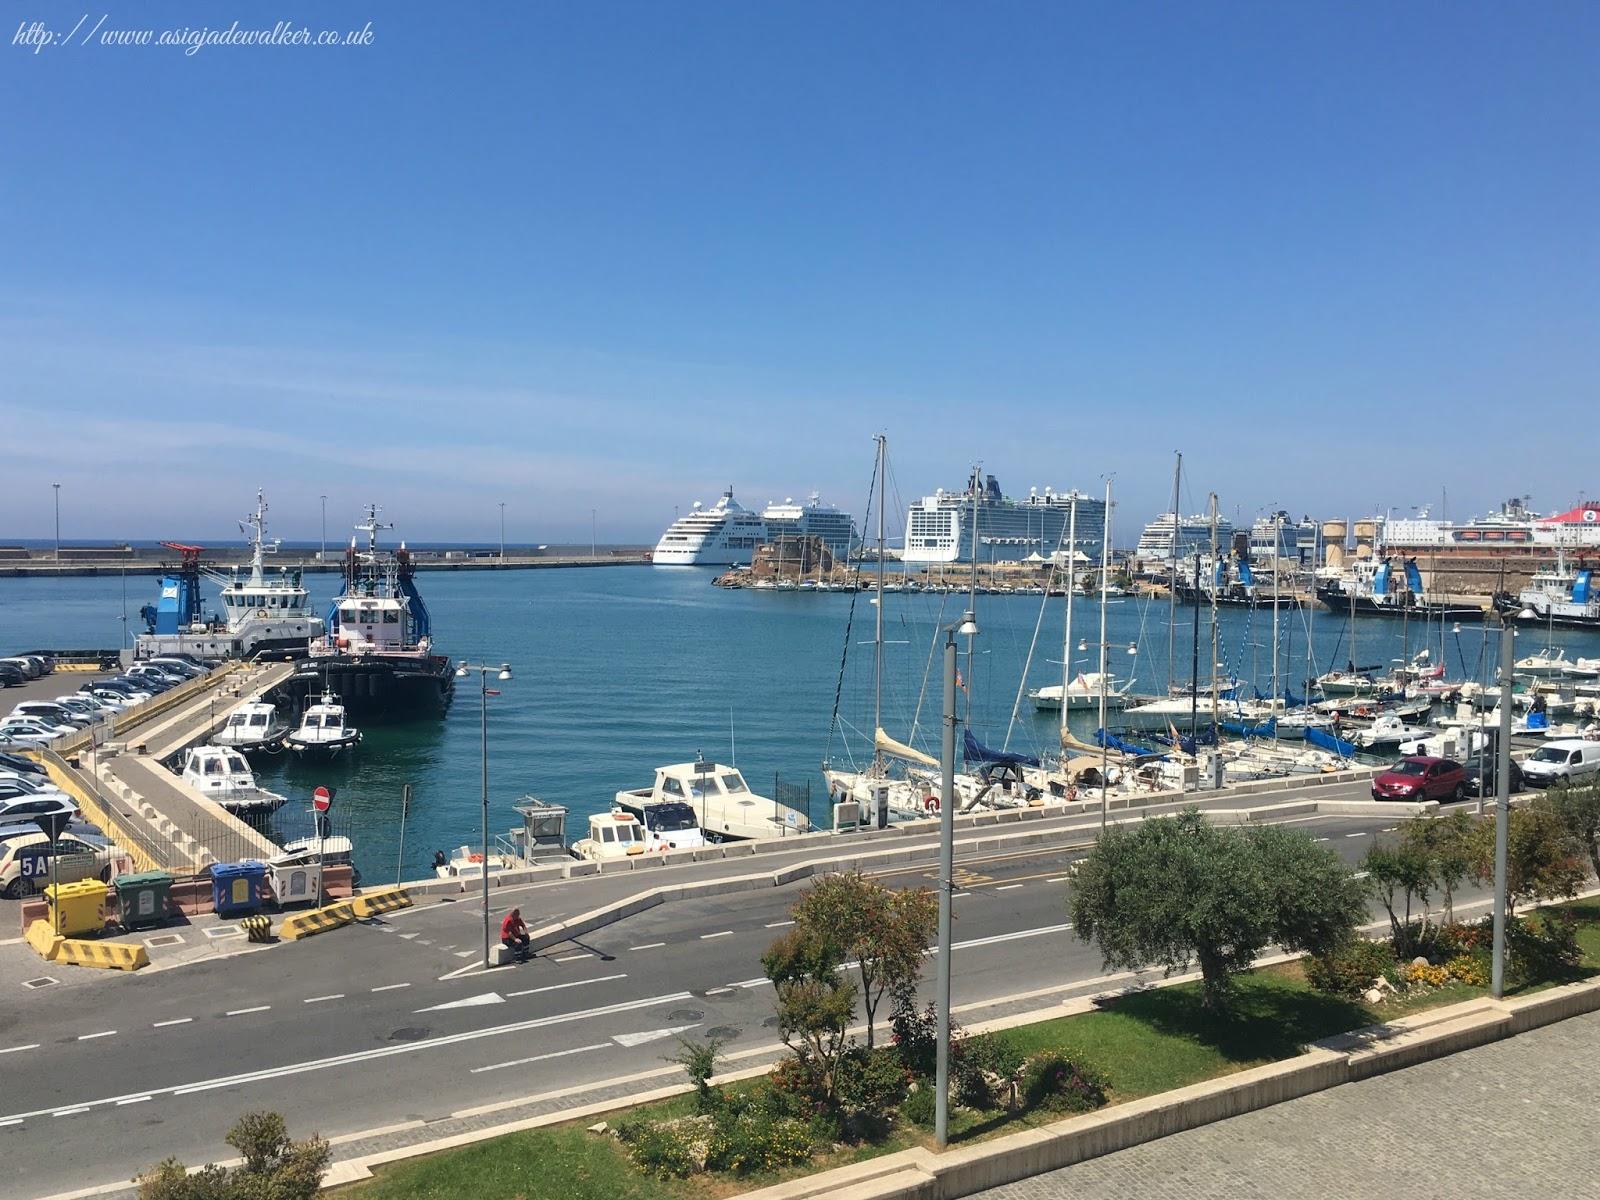 My Mediterranean Holiday 2017   Day 6: Civitavecchia (Italy)